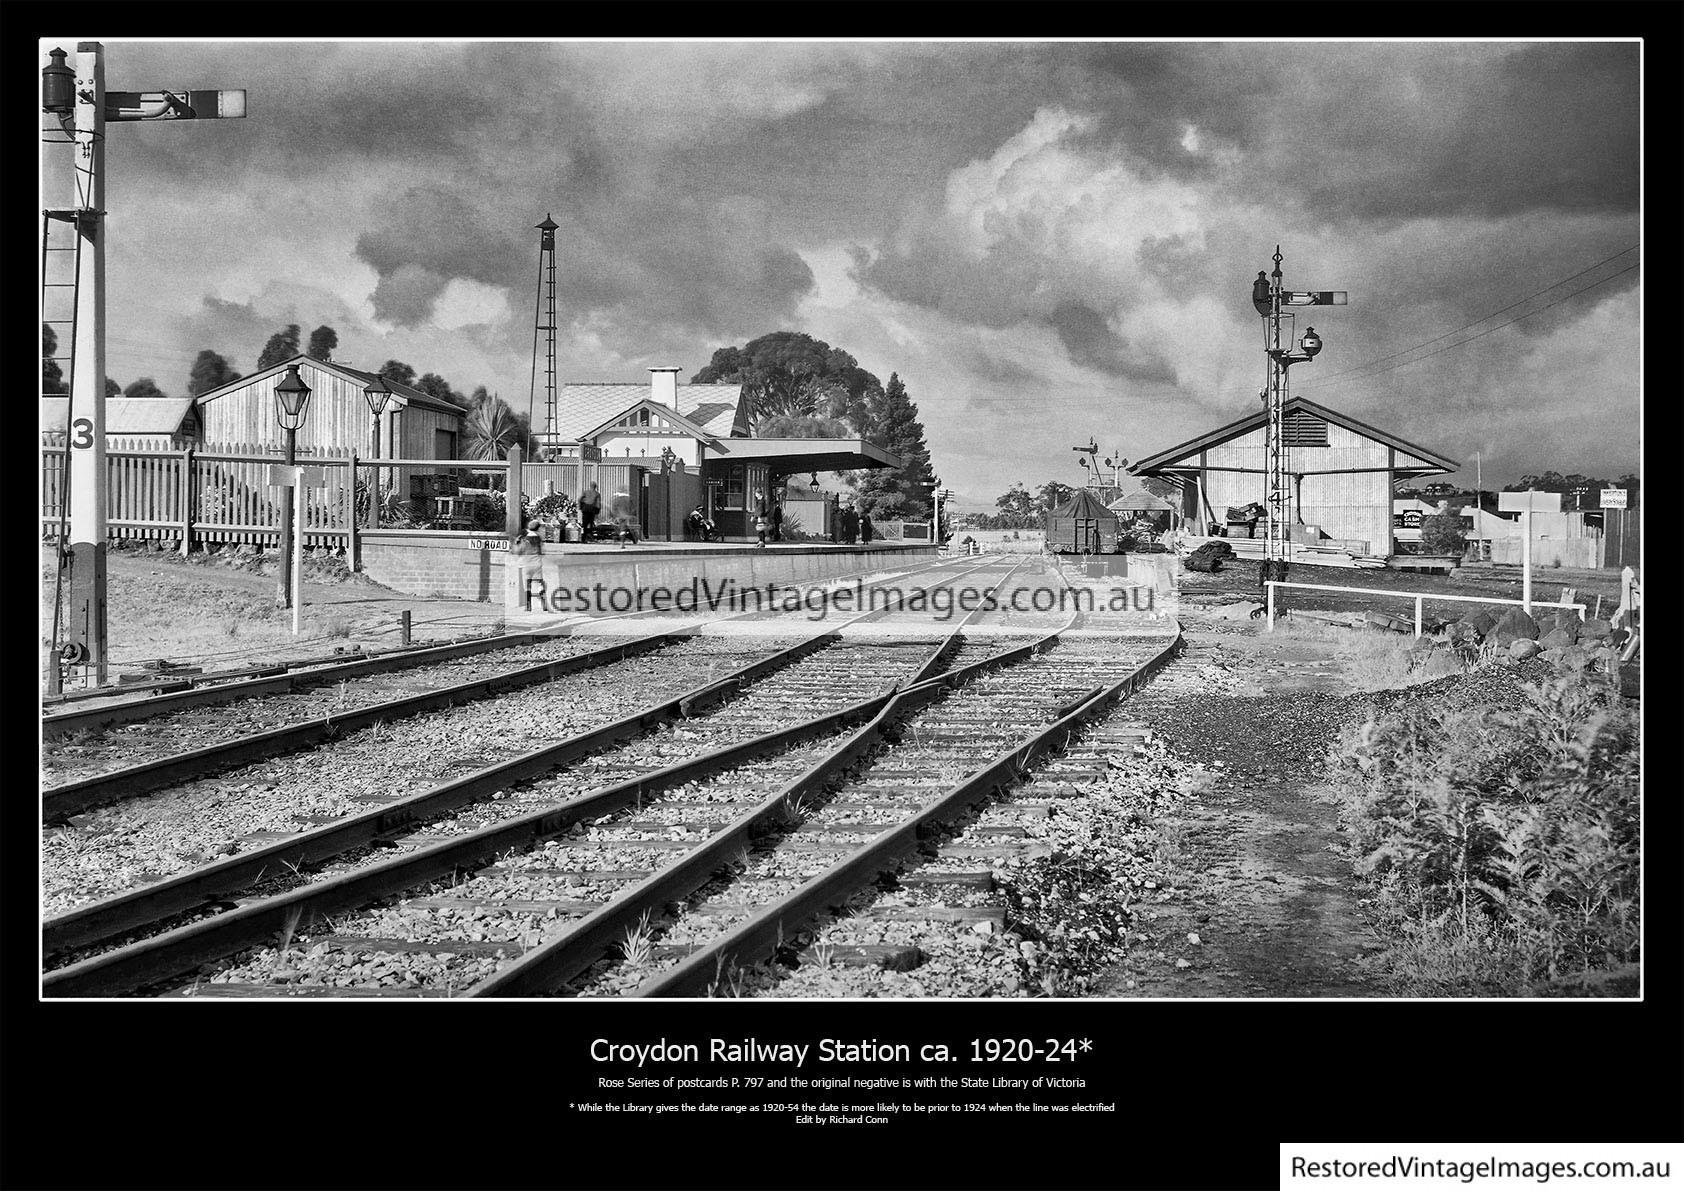 Croydon Railway Station 1920-24